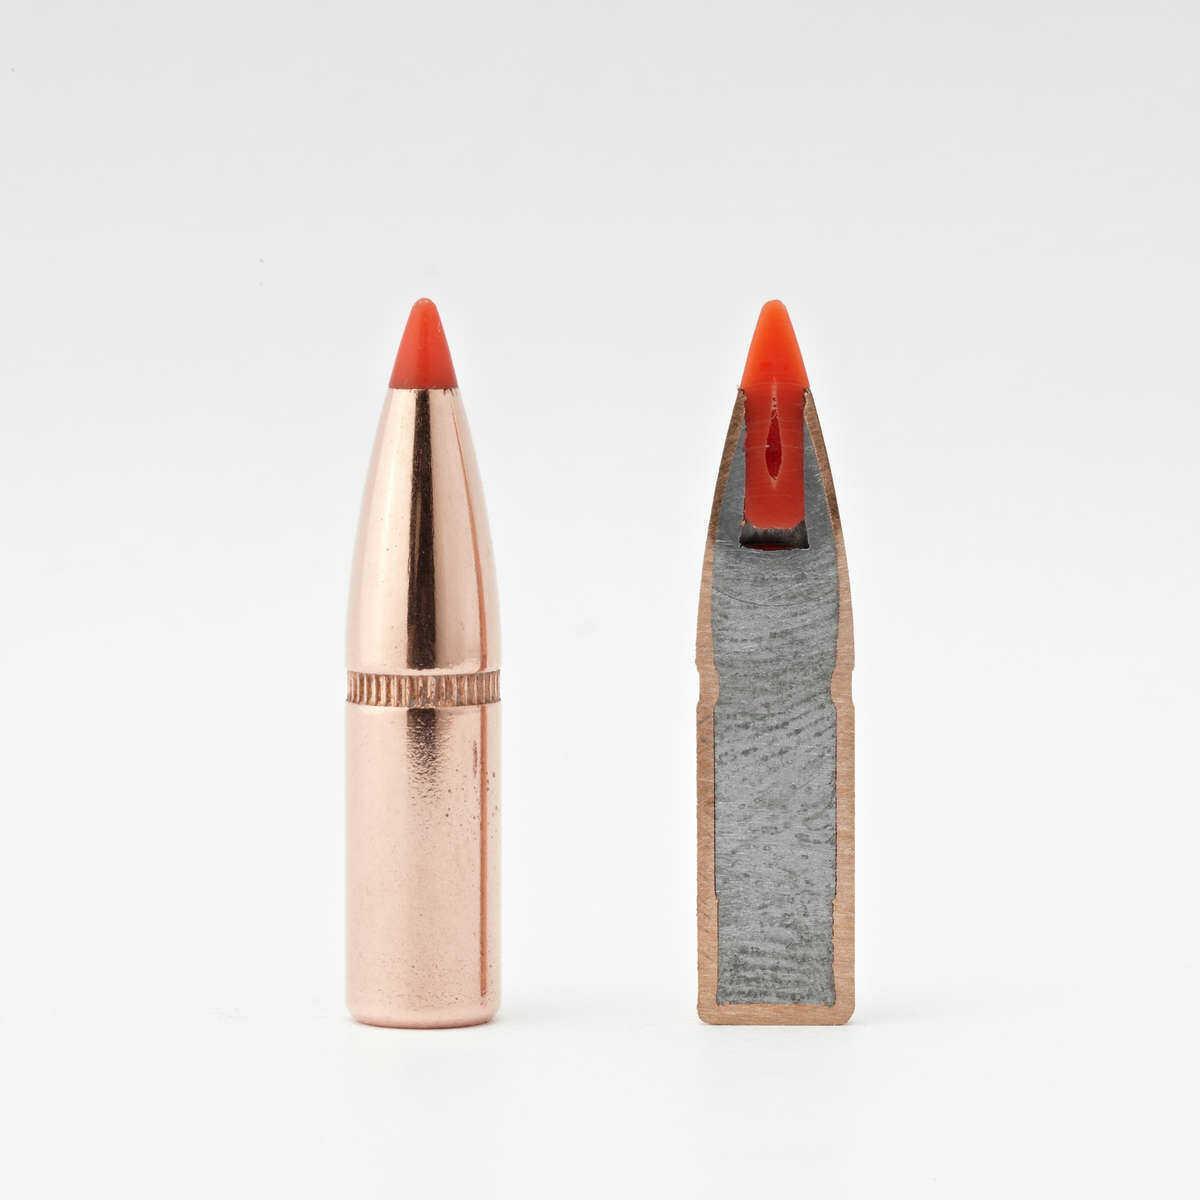 Hornady Rifle Bullet 6MM Caliber 95 Grain Super Shock Tip 100/Box Md: 24532